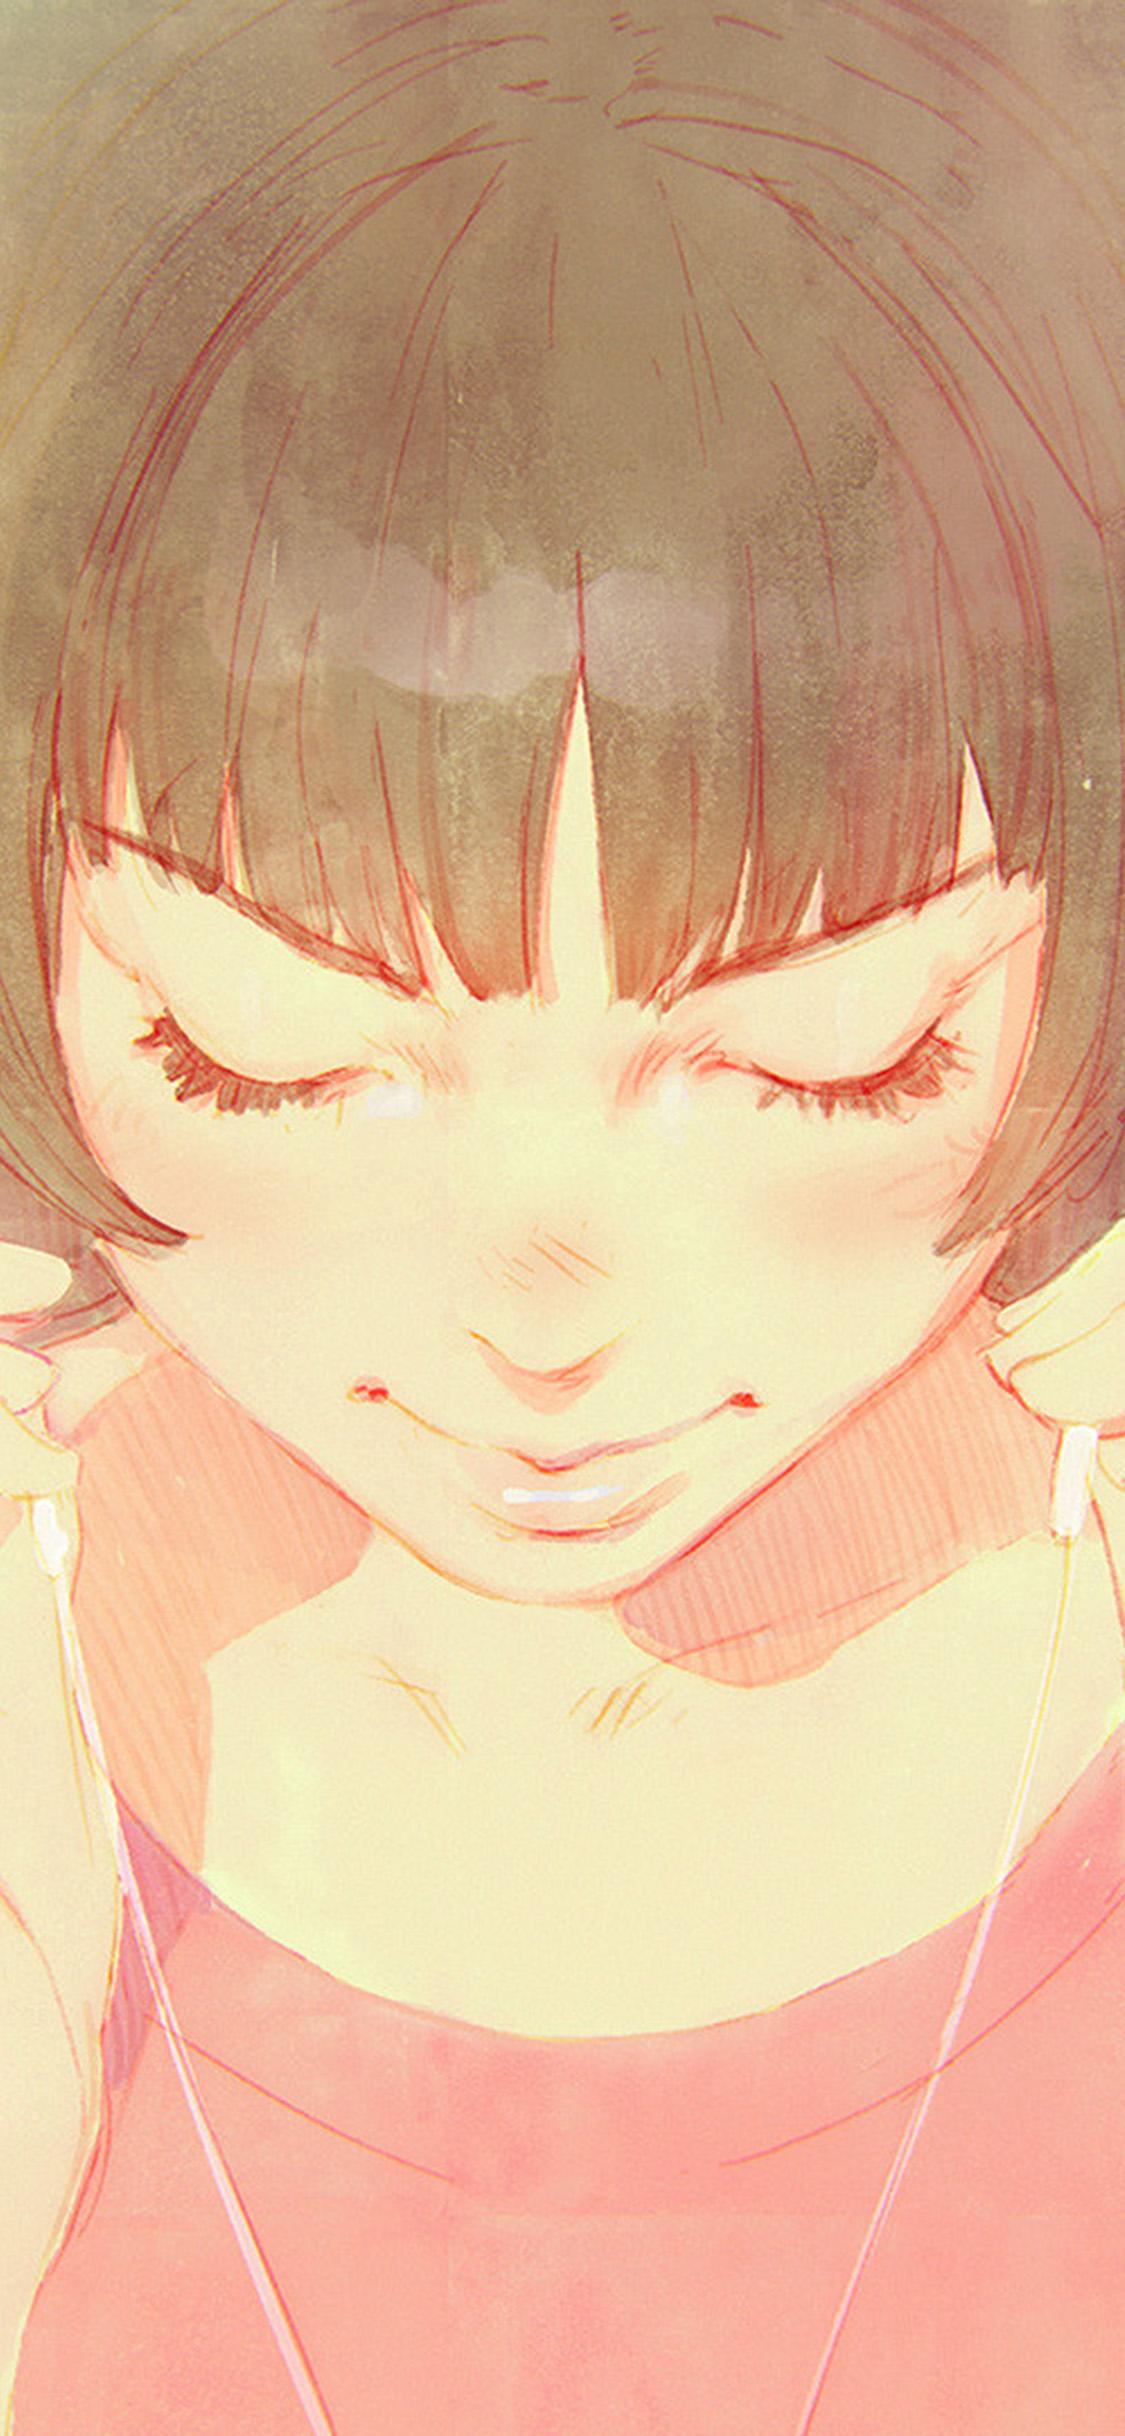 iPhonexpapers.com-Apple-iPhone-wallpaper-bj12-anime-ilya-face-girl-art